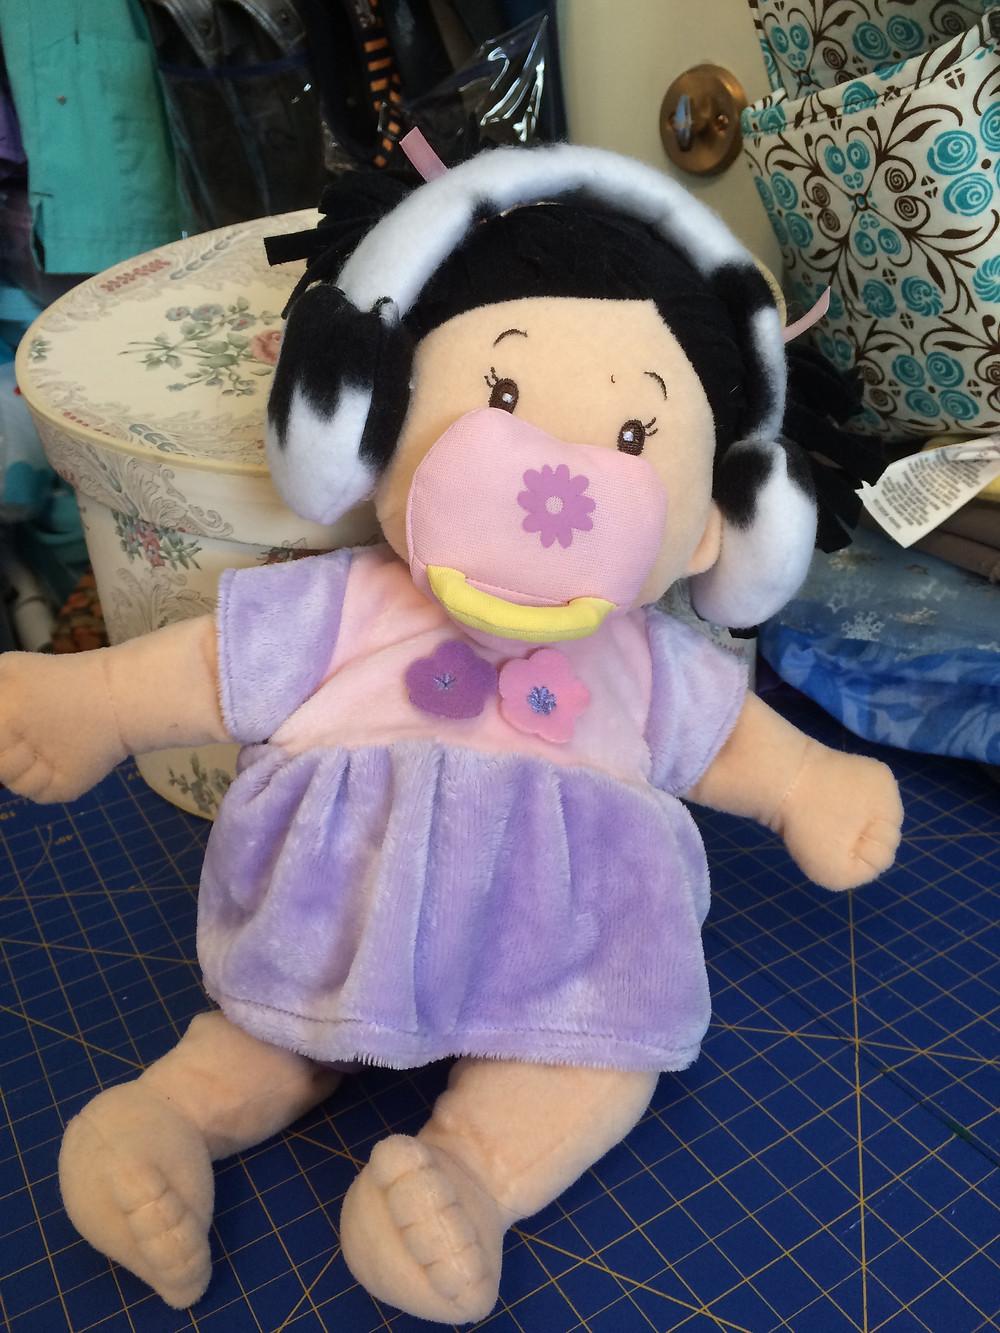 Doll ear muffs